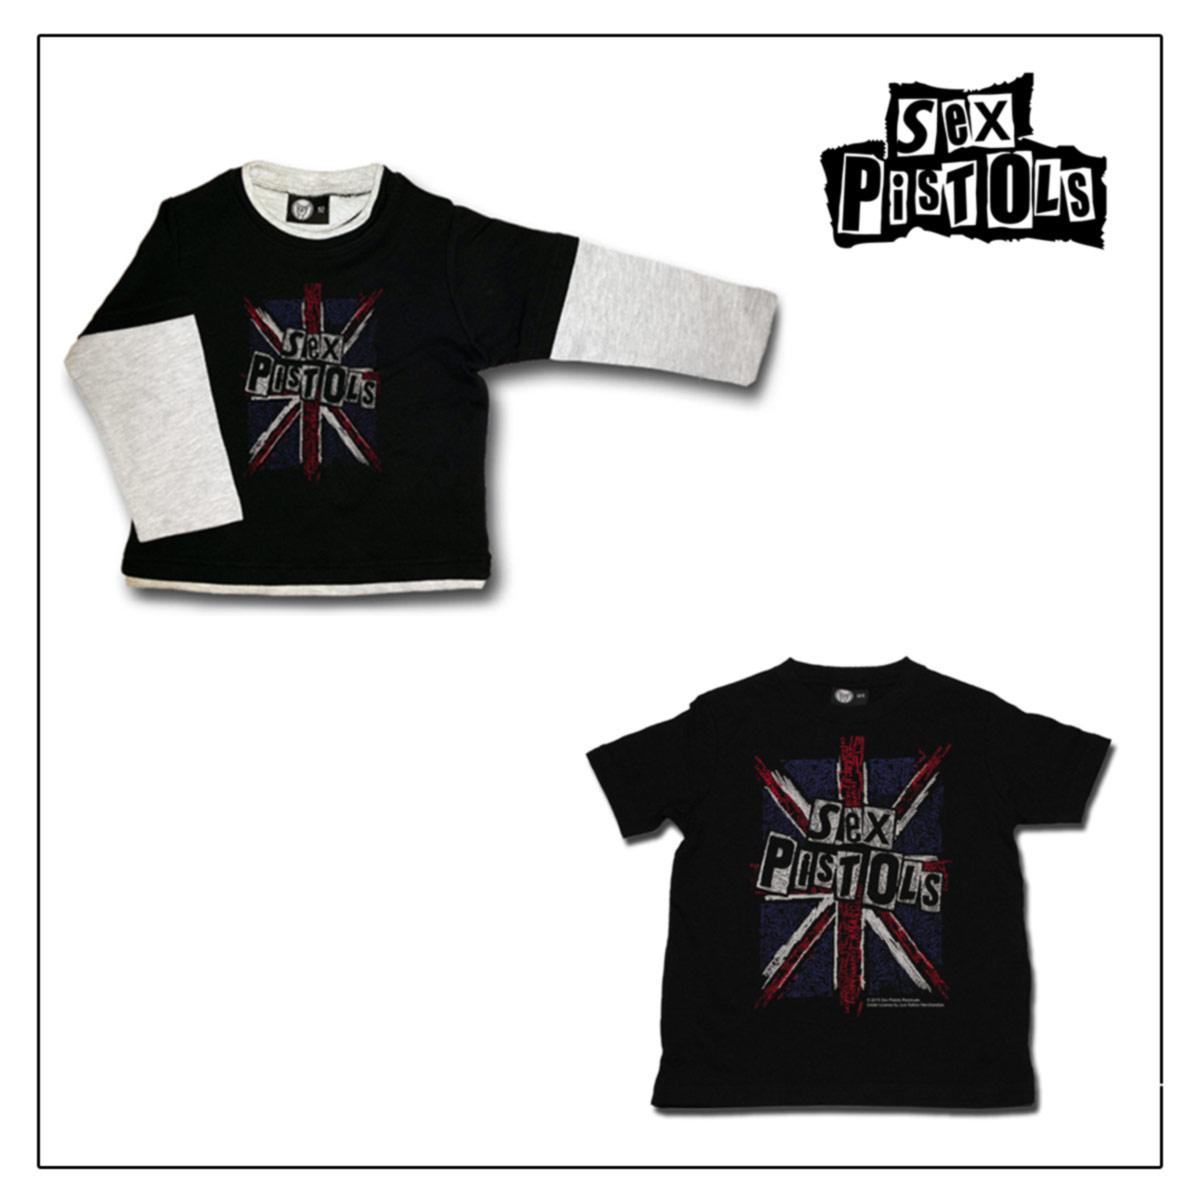 SEX PISTOLS, T-shirt Bambino 2-10 anni